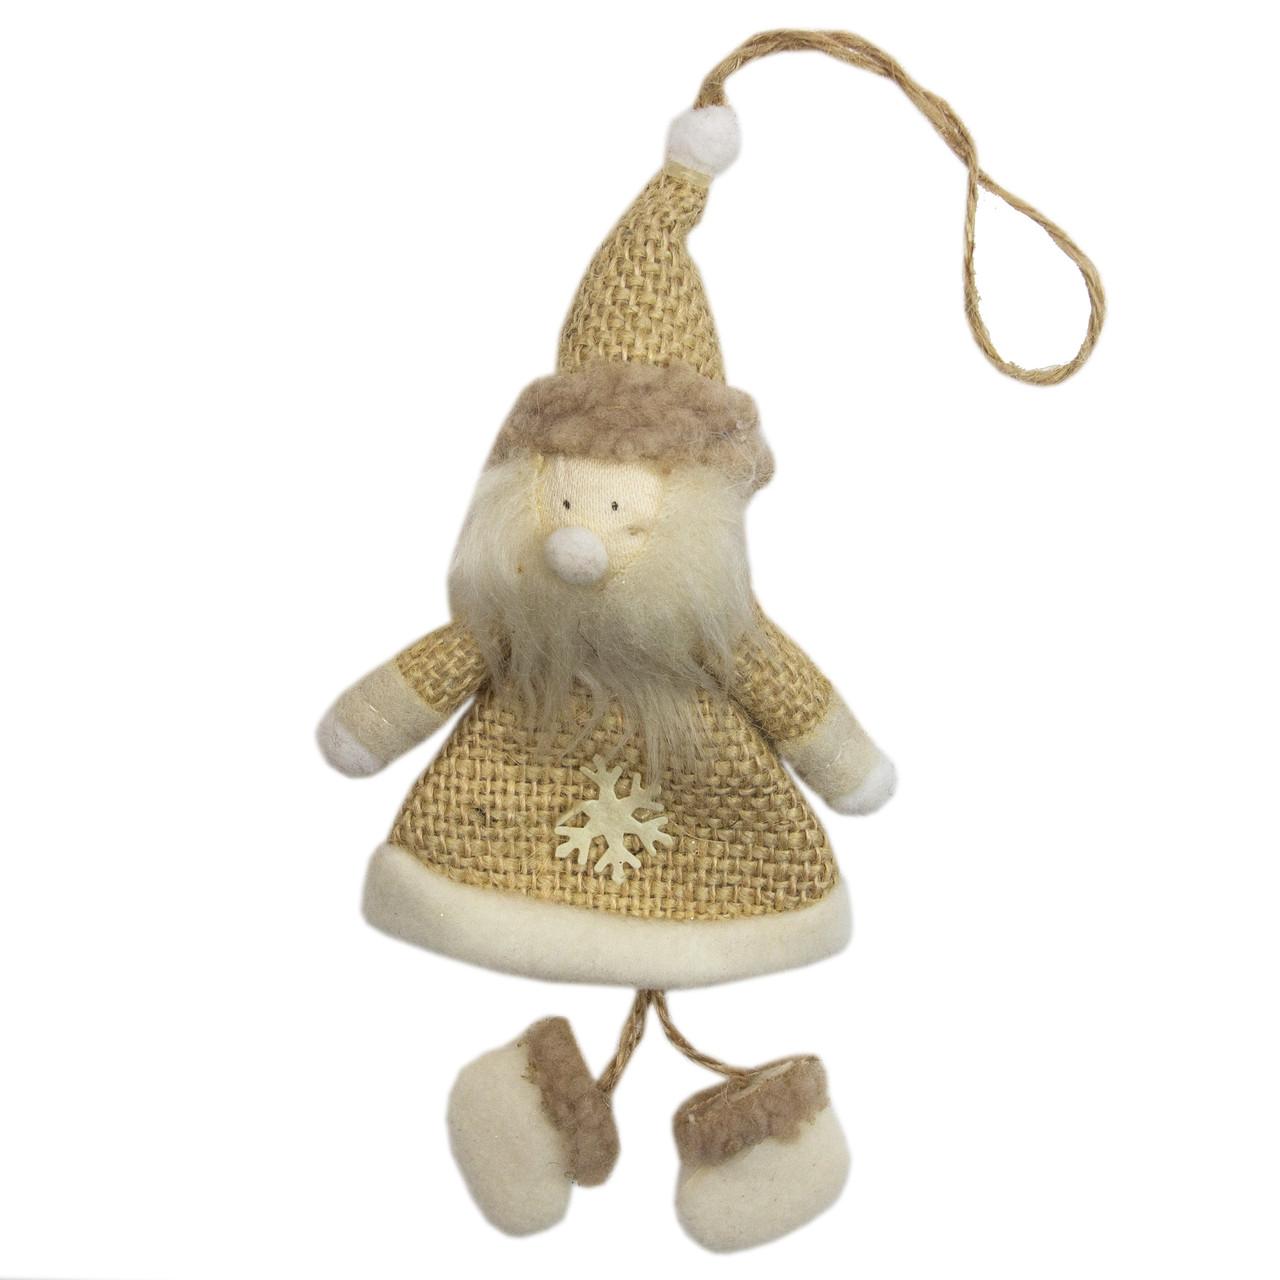 Елочная игрушка - Дед Мороз, 16 см (220280-1)